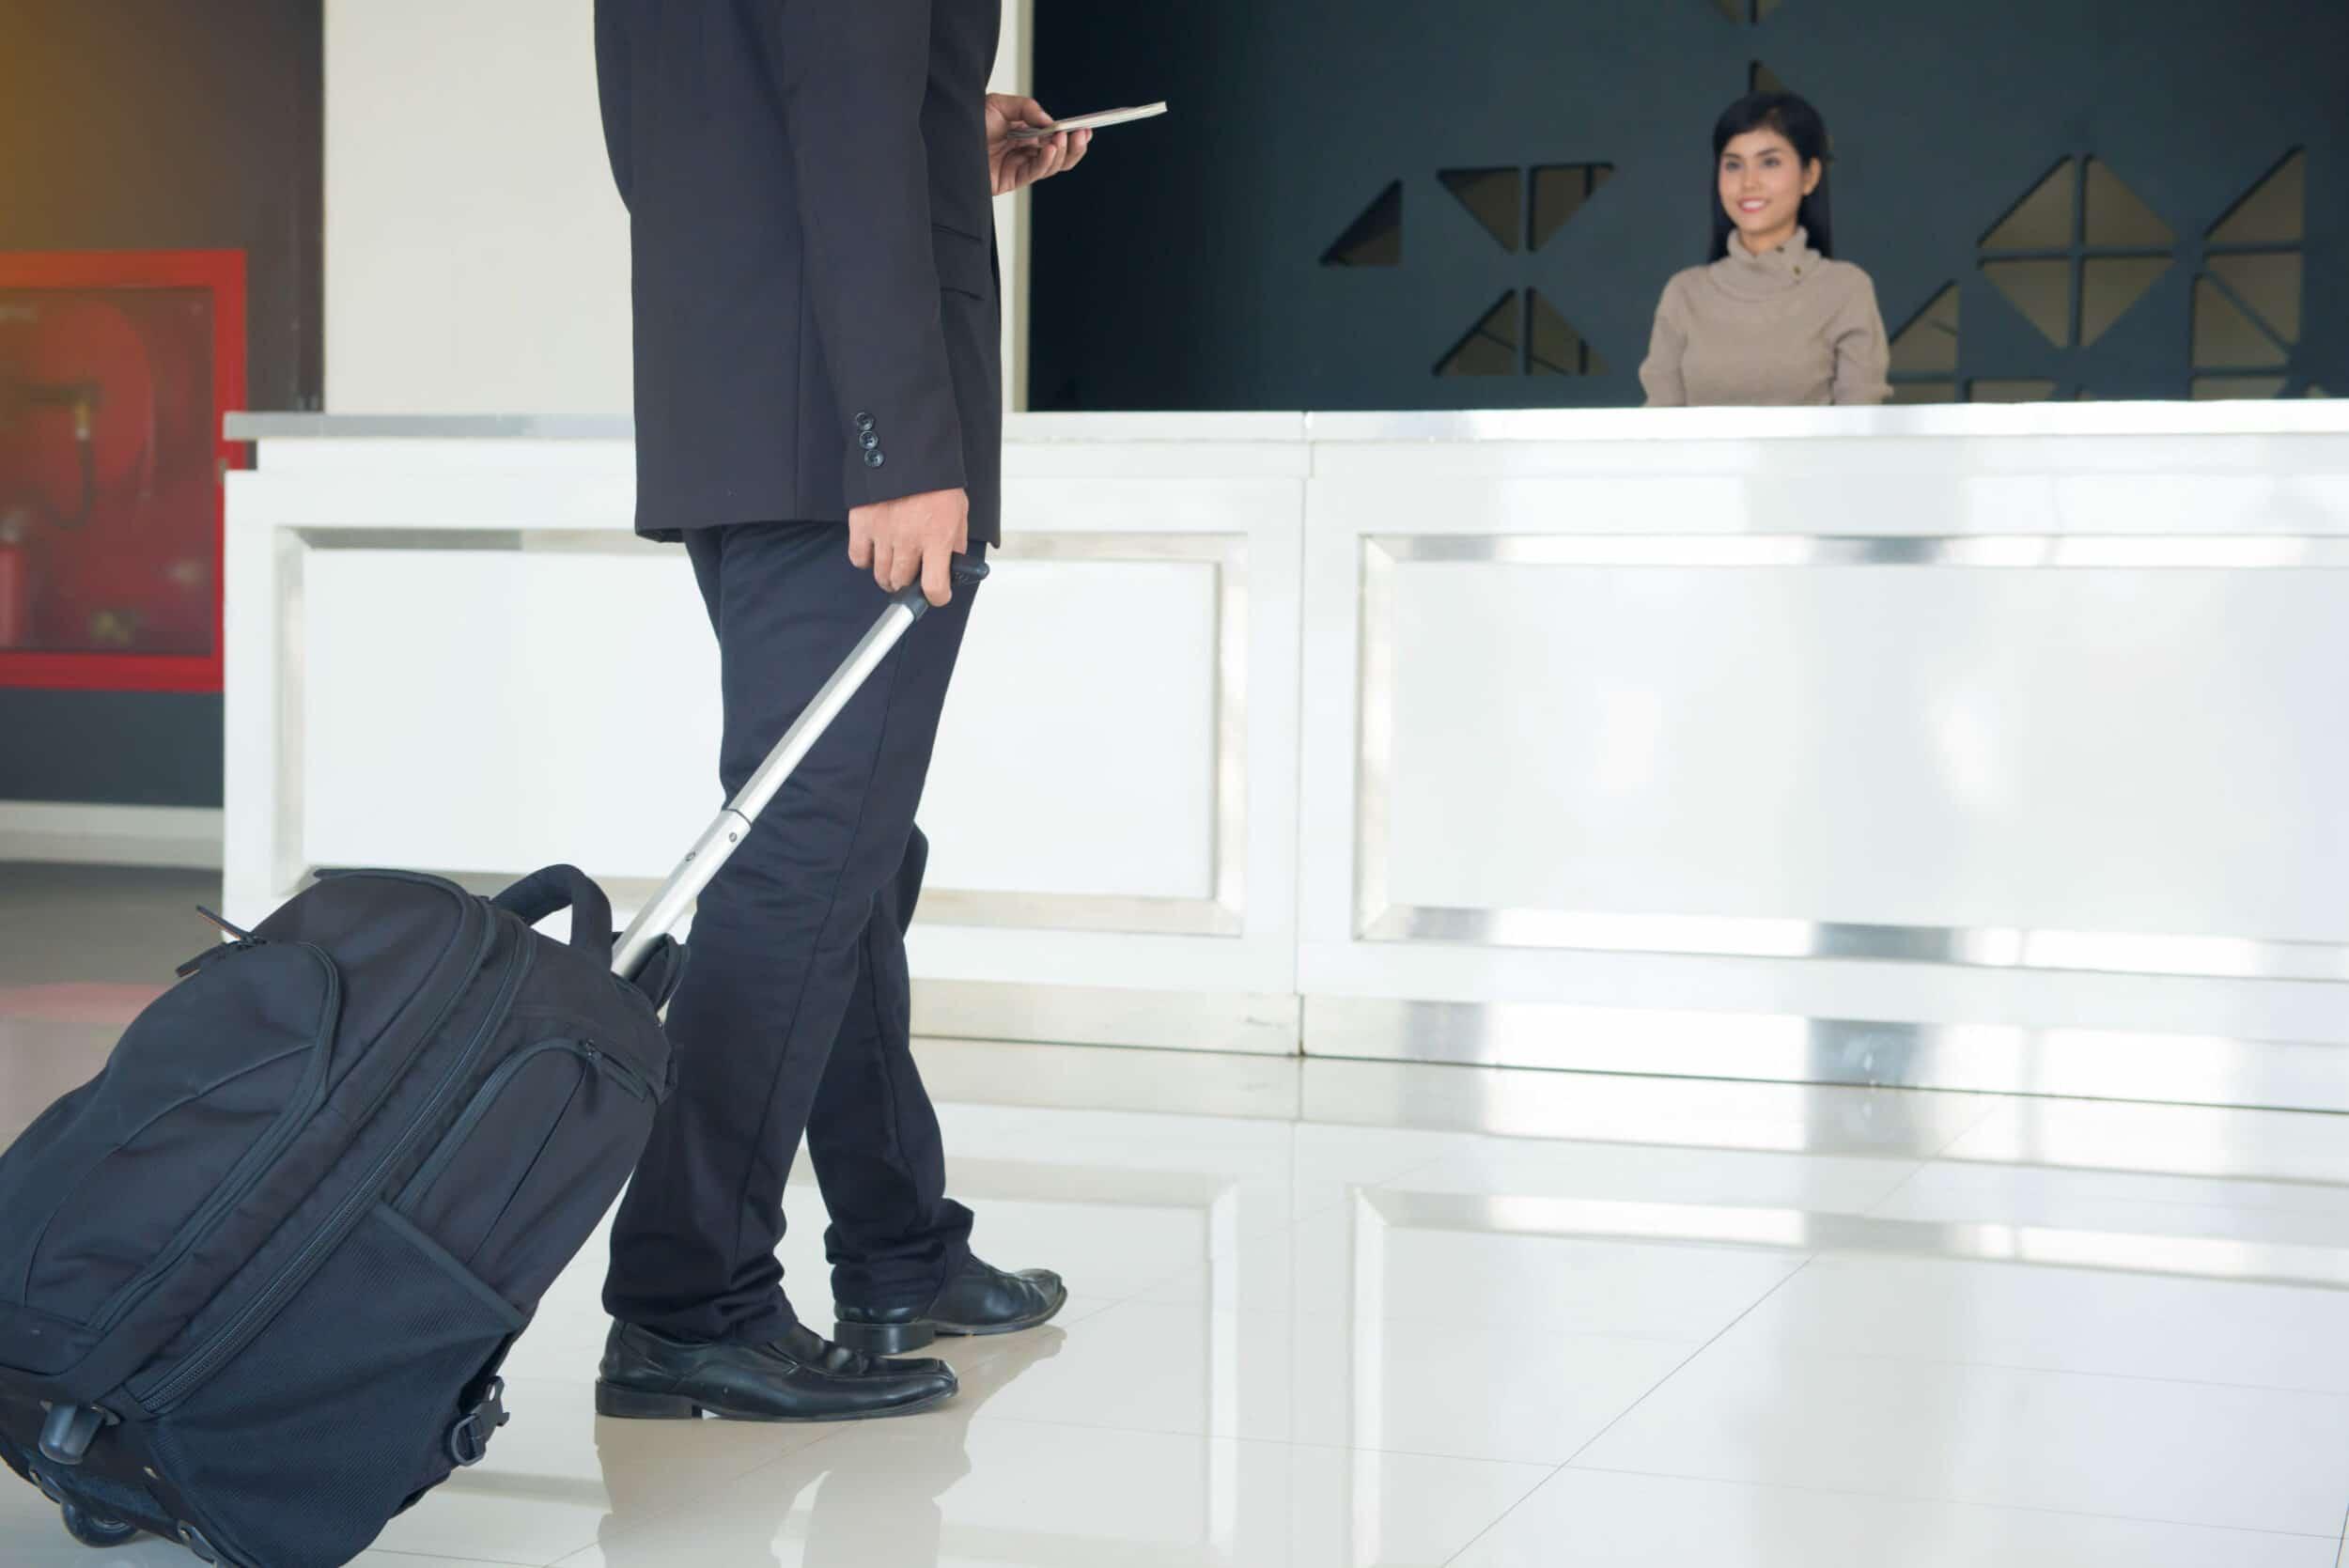 Zakenman checkt in bij hotel dicht bij de luchthaven - Chateau Residenties